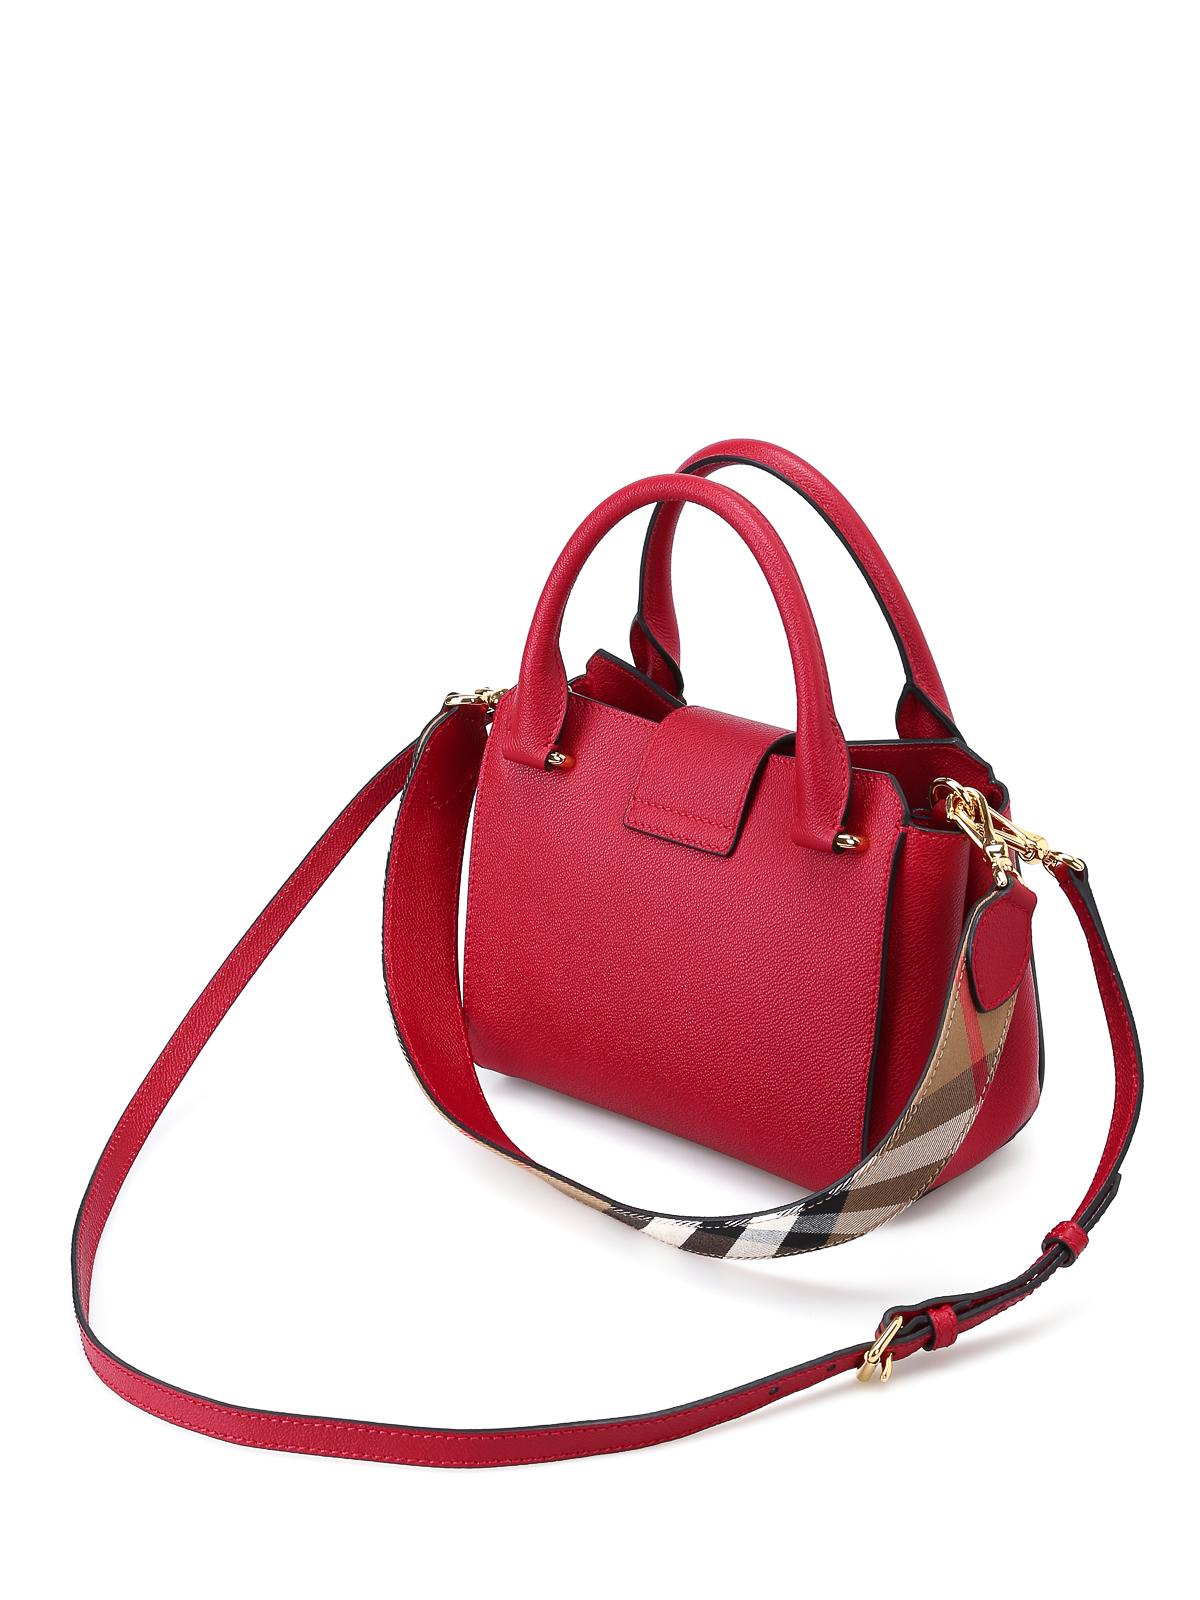 Burberry - Soft grain small buckle tote - bowling bags - 4033751 6e7ed44ae621a